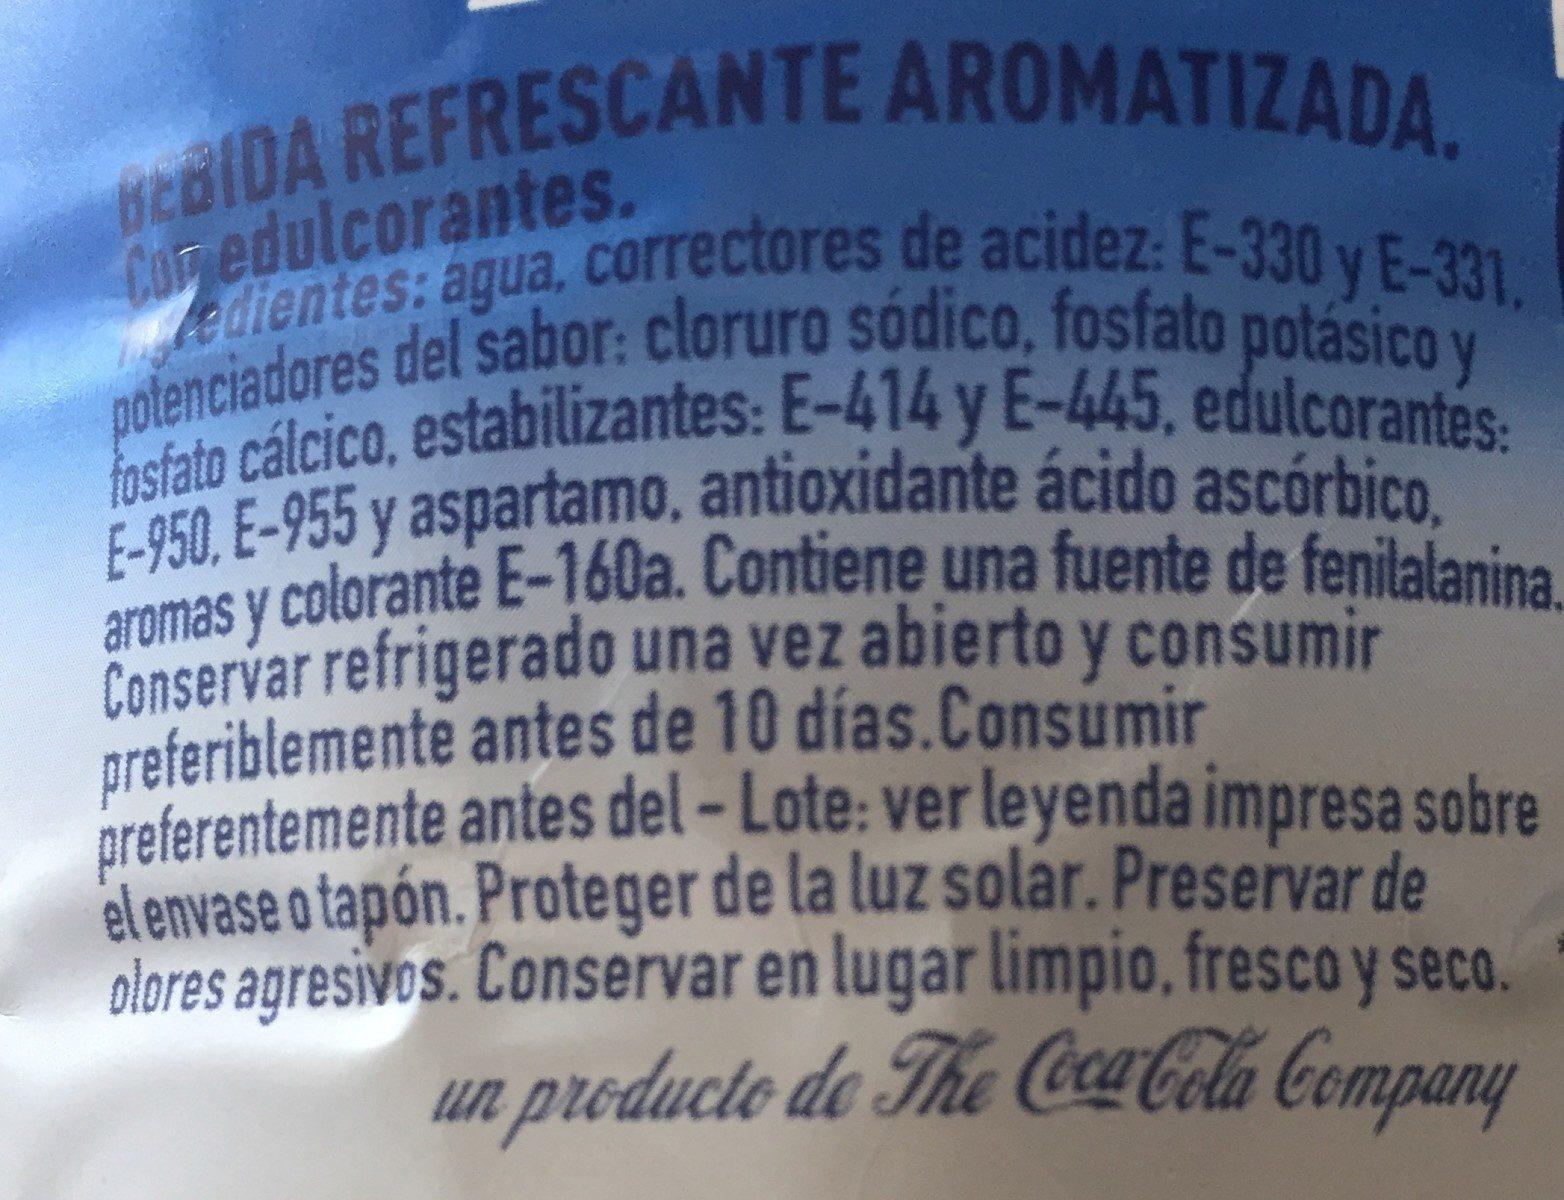 Aquarius Libre Naranja Botella Sin Azúcar - Ingredients